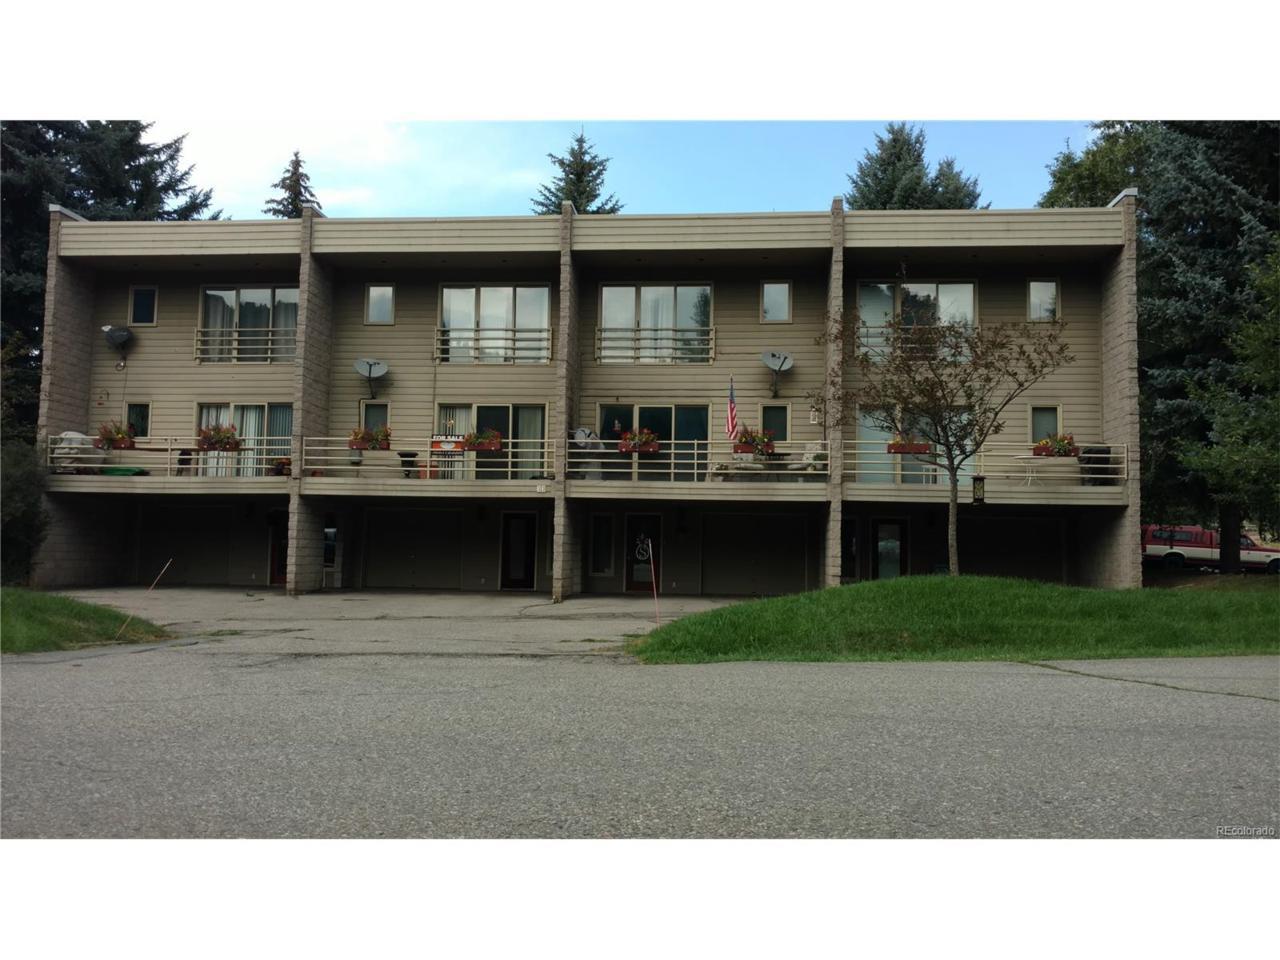 33 Larkspur Lane B, Avon, CO 81620 (MLS #5542459) :: 8z Real Estate